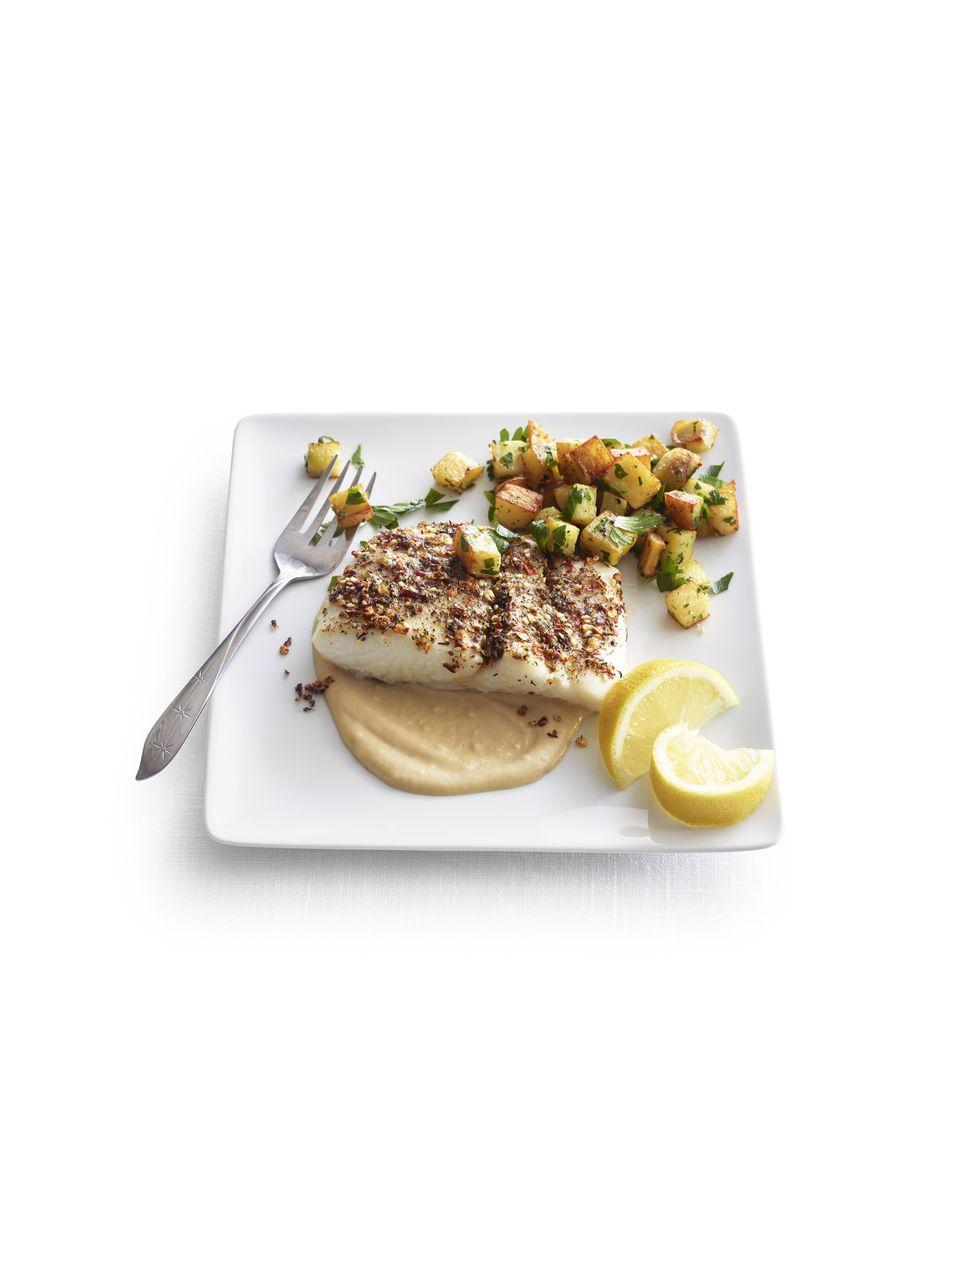 Roasted halibut with tahini sauce & diced potatoes